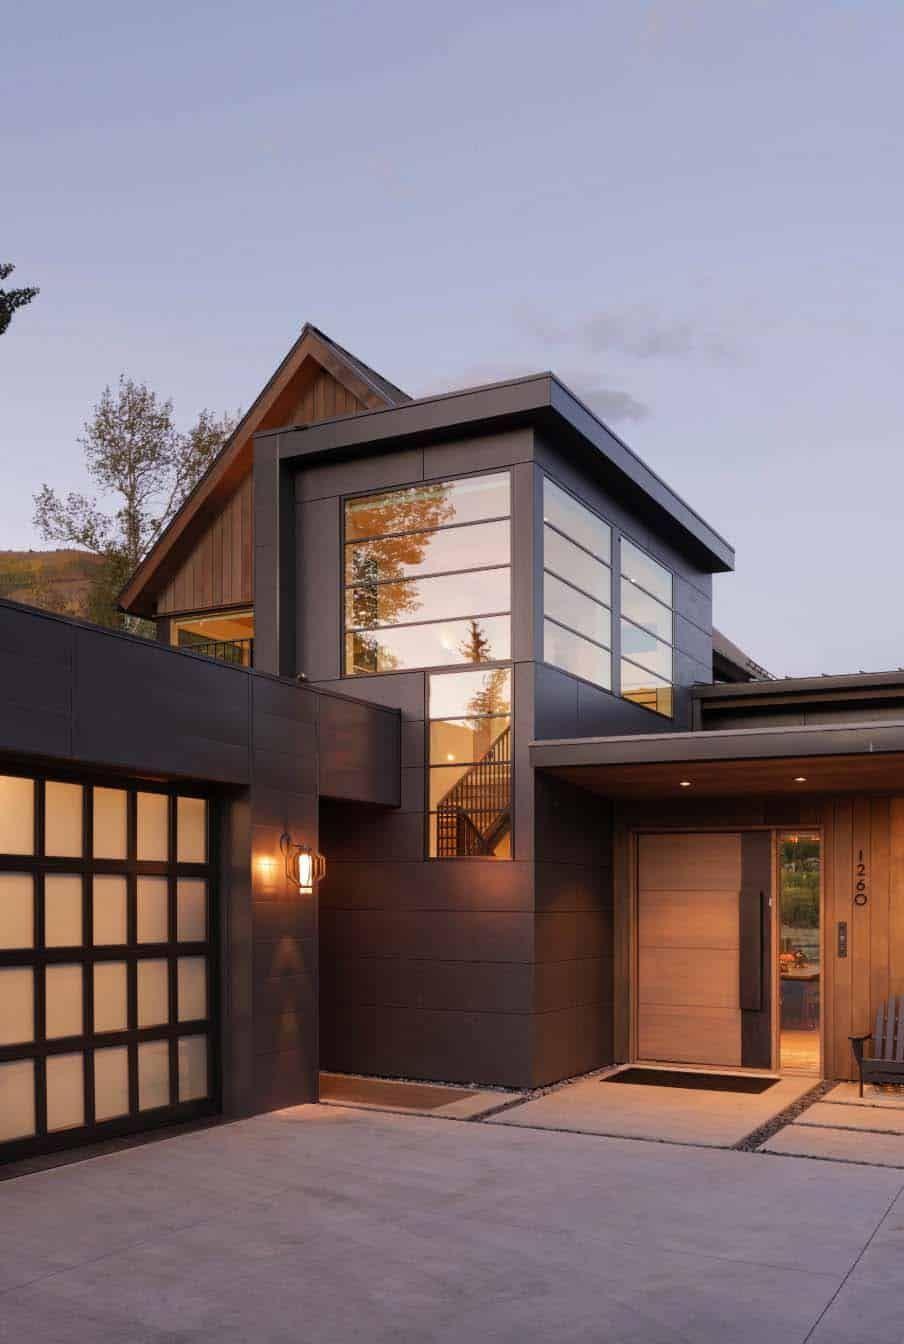 Contemporary Home In Colorado Delivering Idyllic Mountain Views